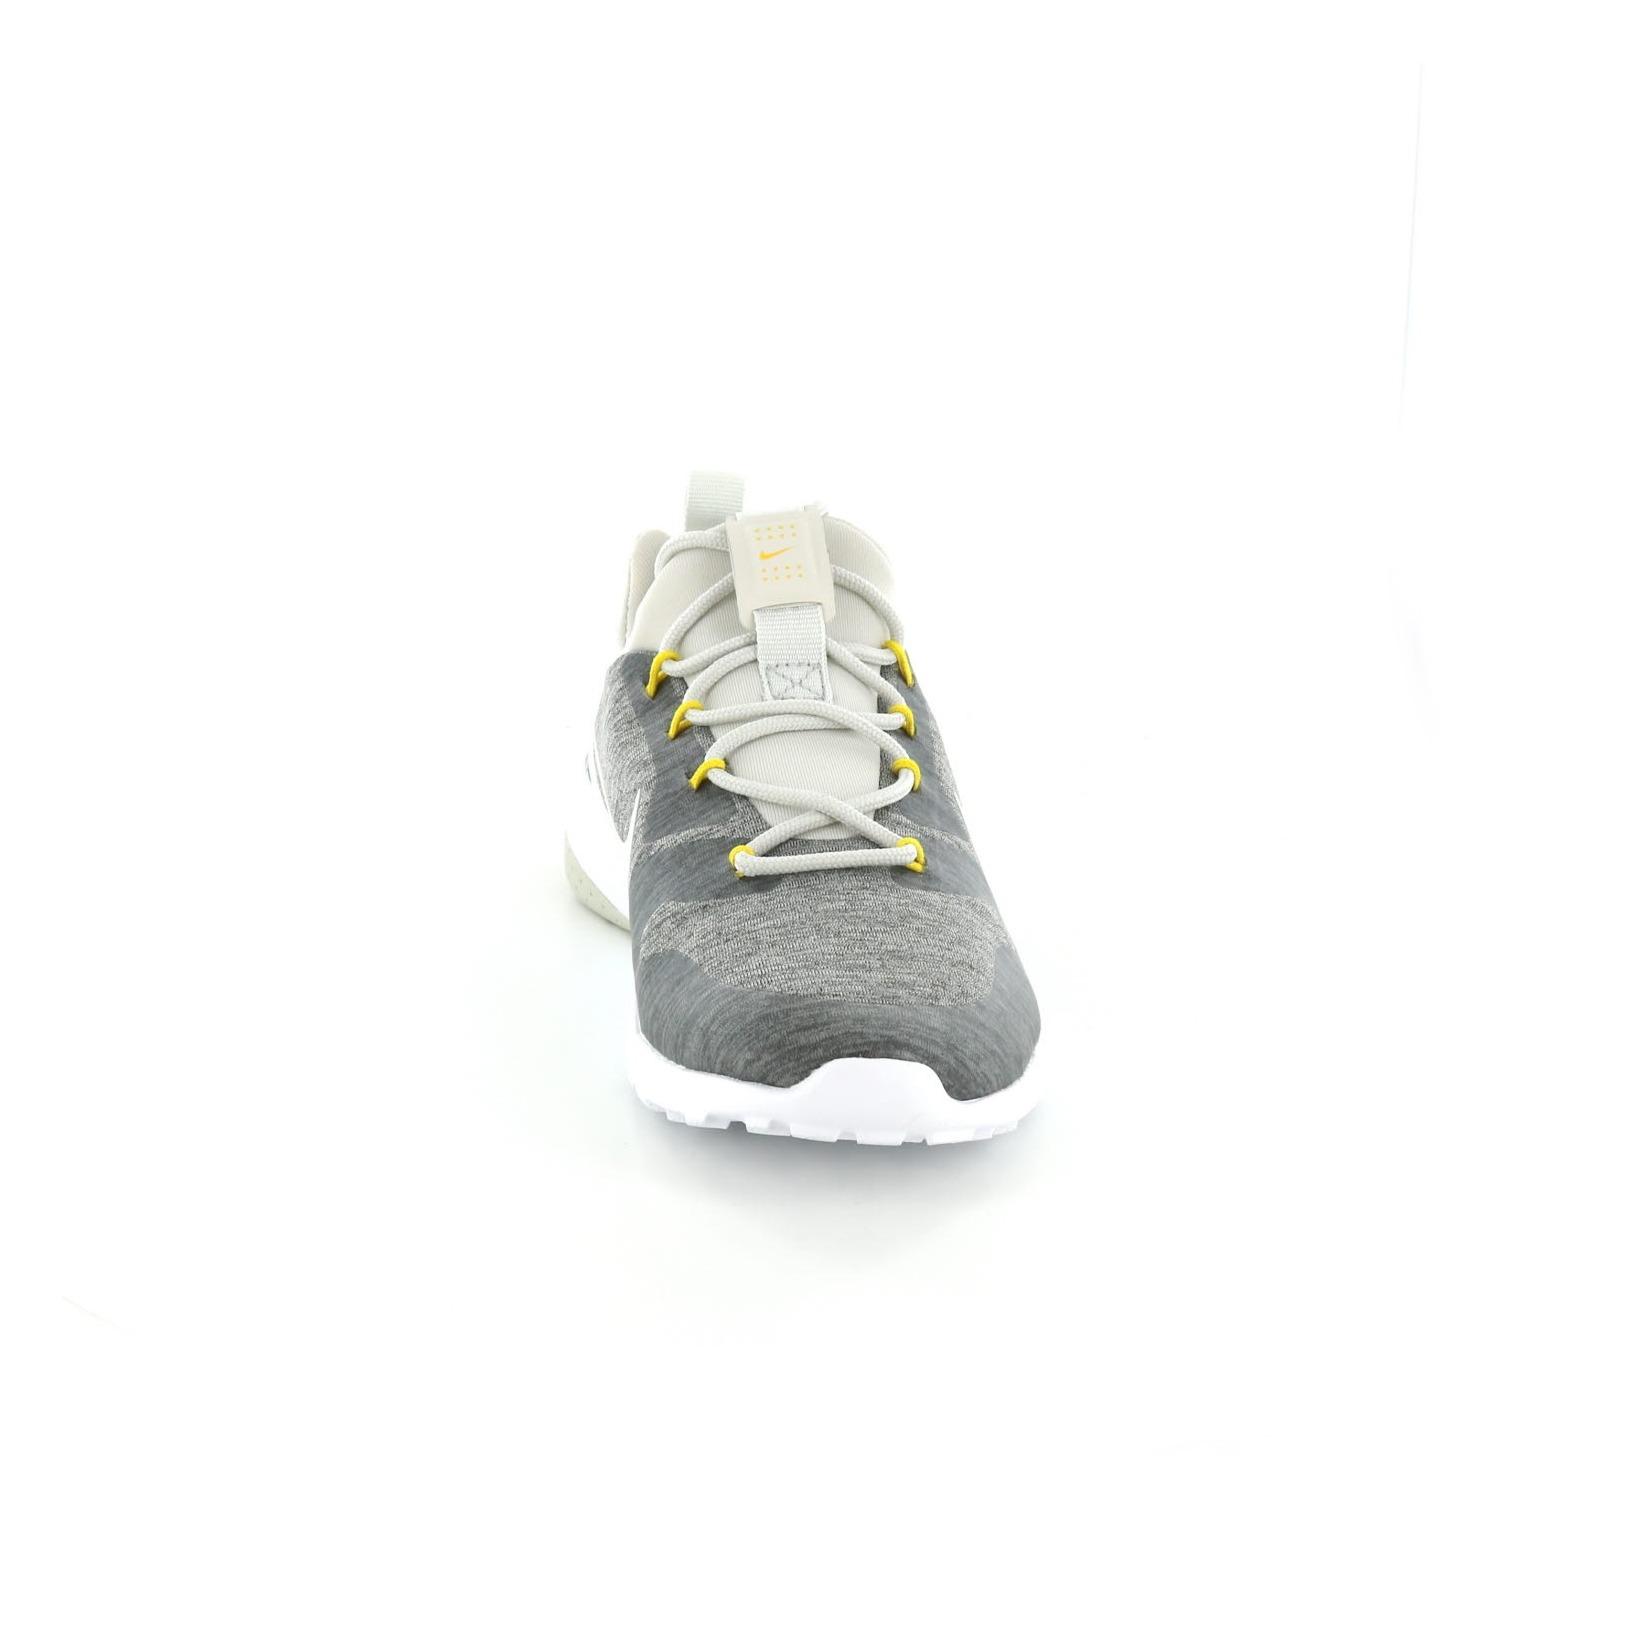 Nike / Pizzo Scarpe - Scarpe Da Ginnastica, Grigio